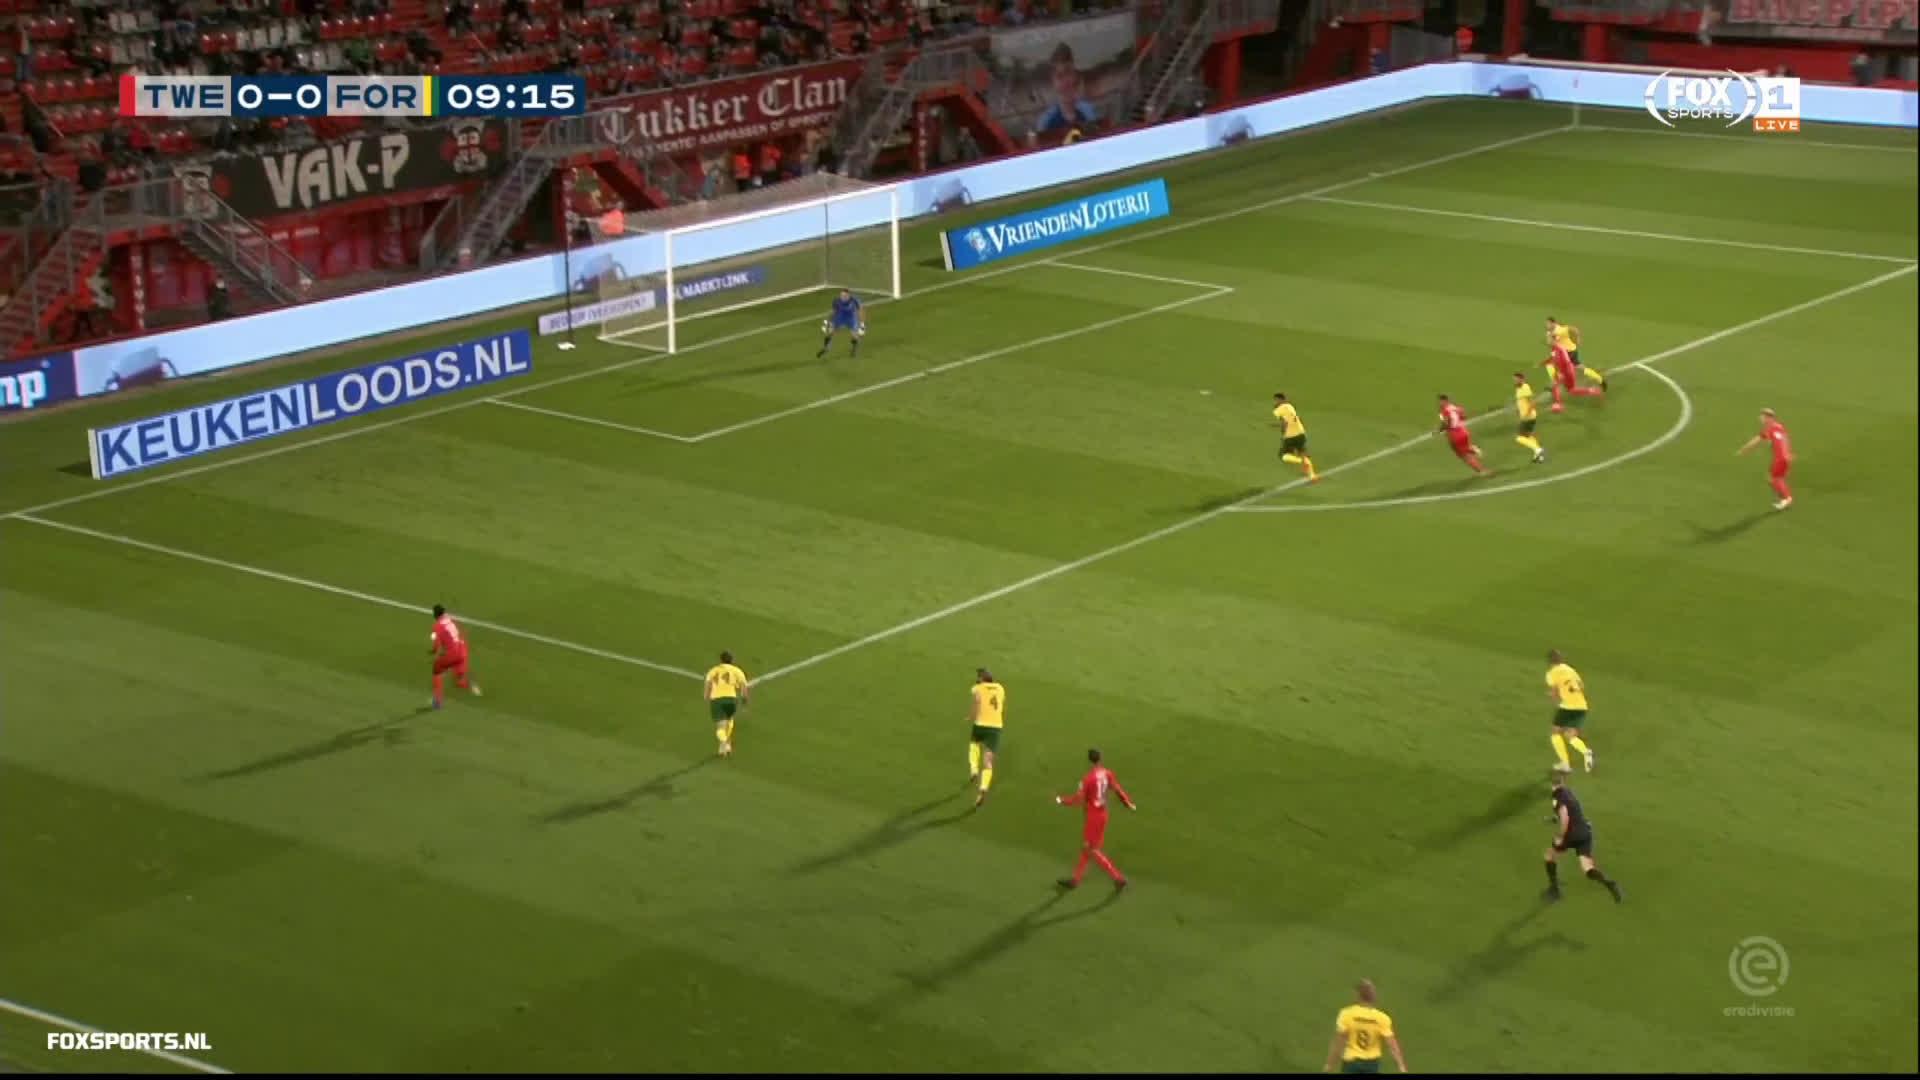 FC Twente [1]-0 Fortuna Sittard - Queensy Menig 10'